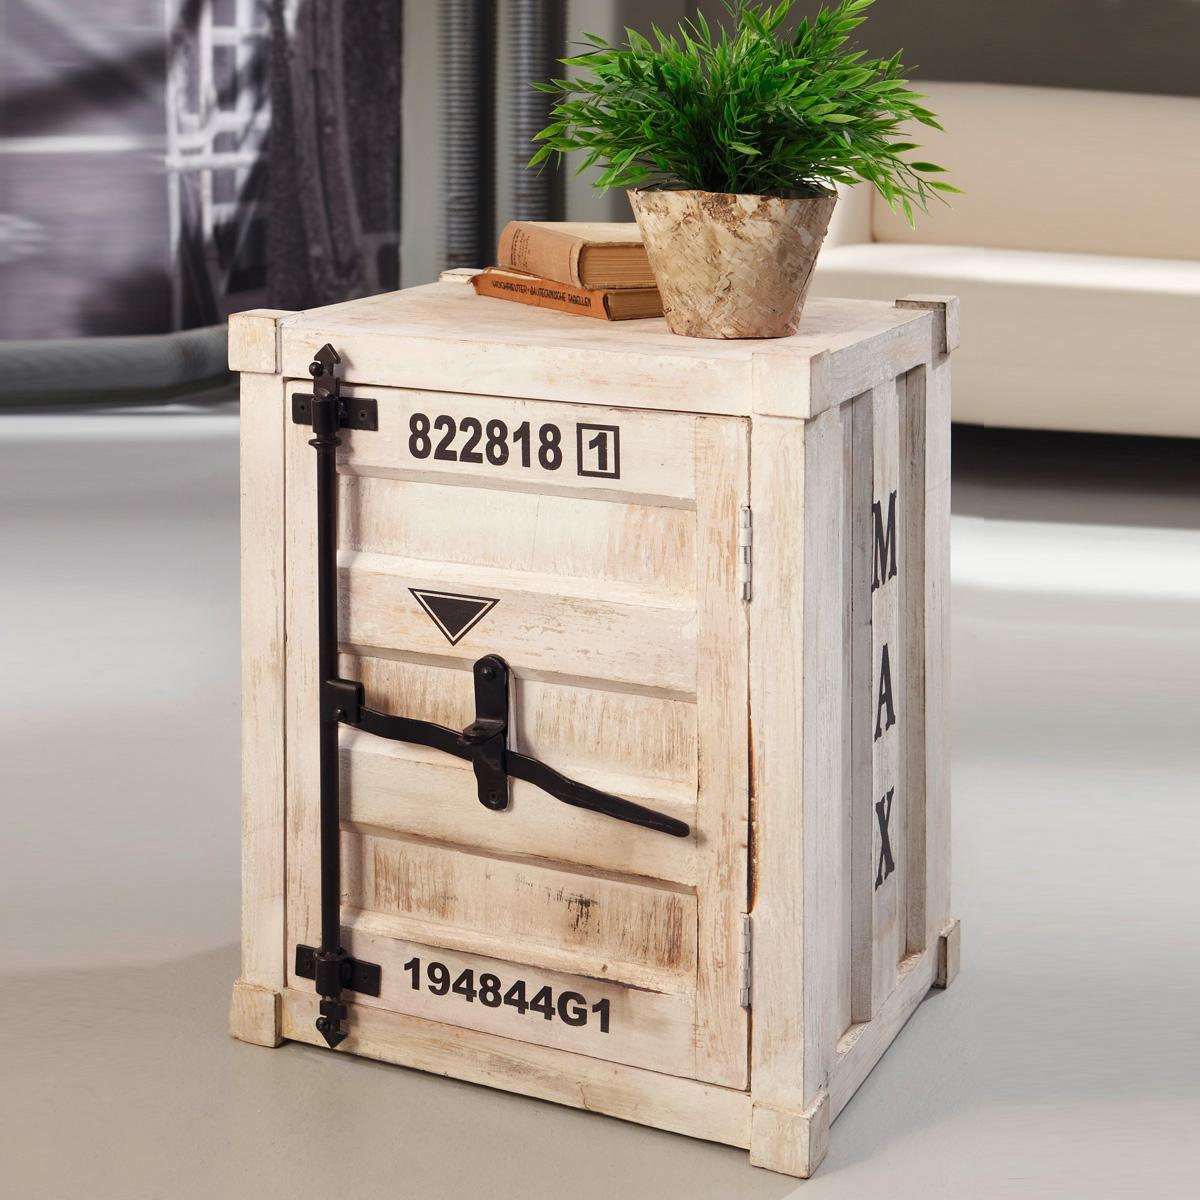 kommode 6905 container von wolf m bel in massivholz akazie antik weiss used look ebay. Black Bedroom Furniture Sets. Home Design Ideas